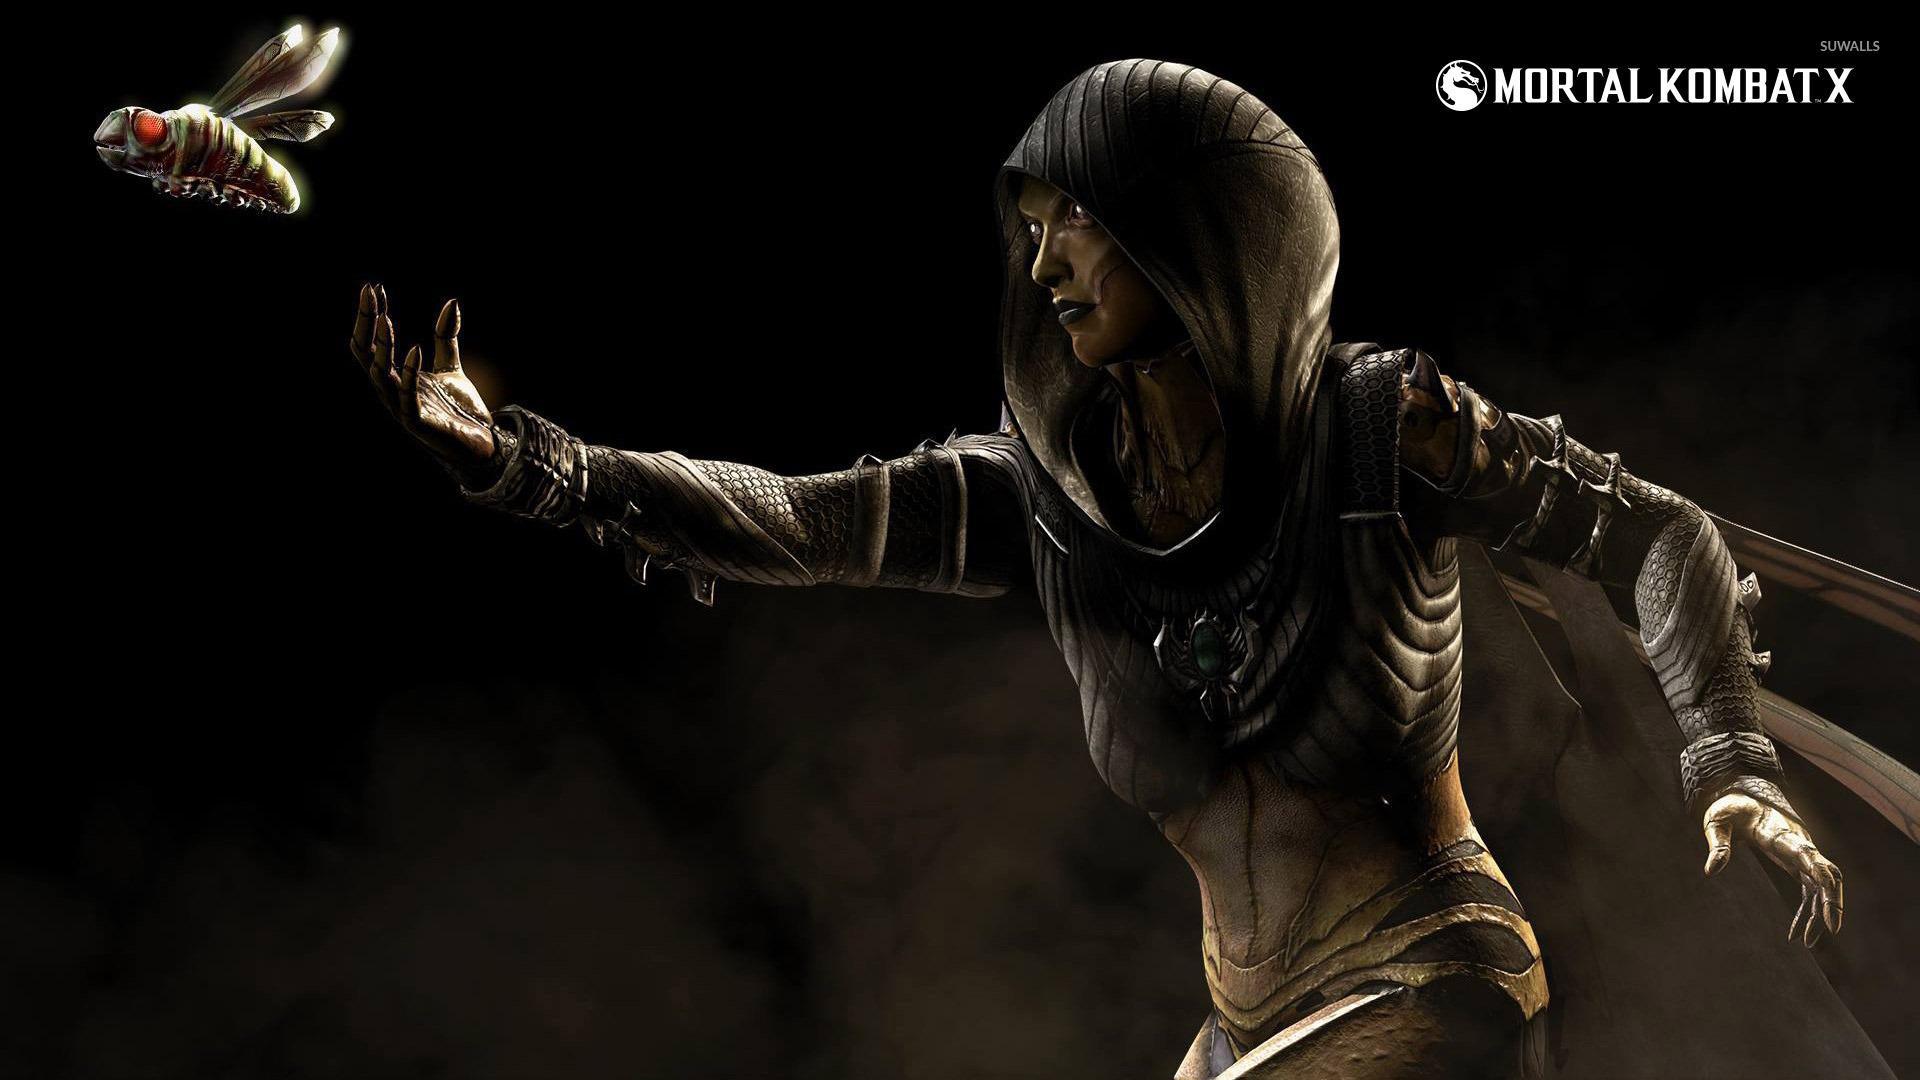 Vorah   Mortal Kombat X wallpaper   Game wallpapers   31449 1920x1080